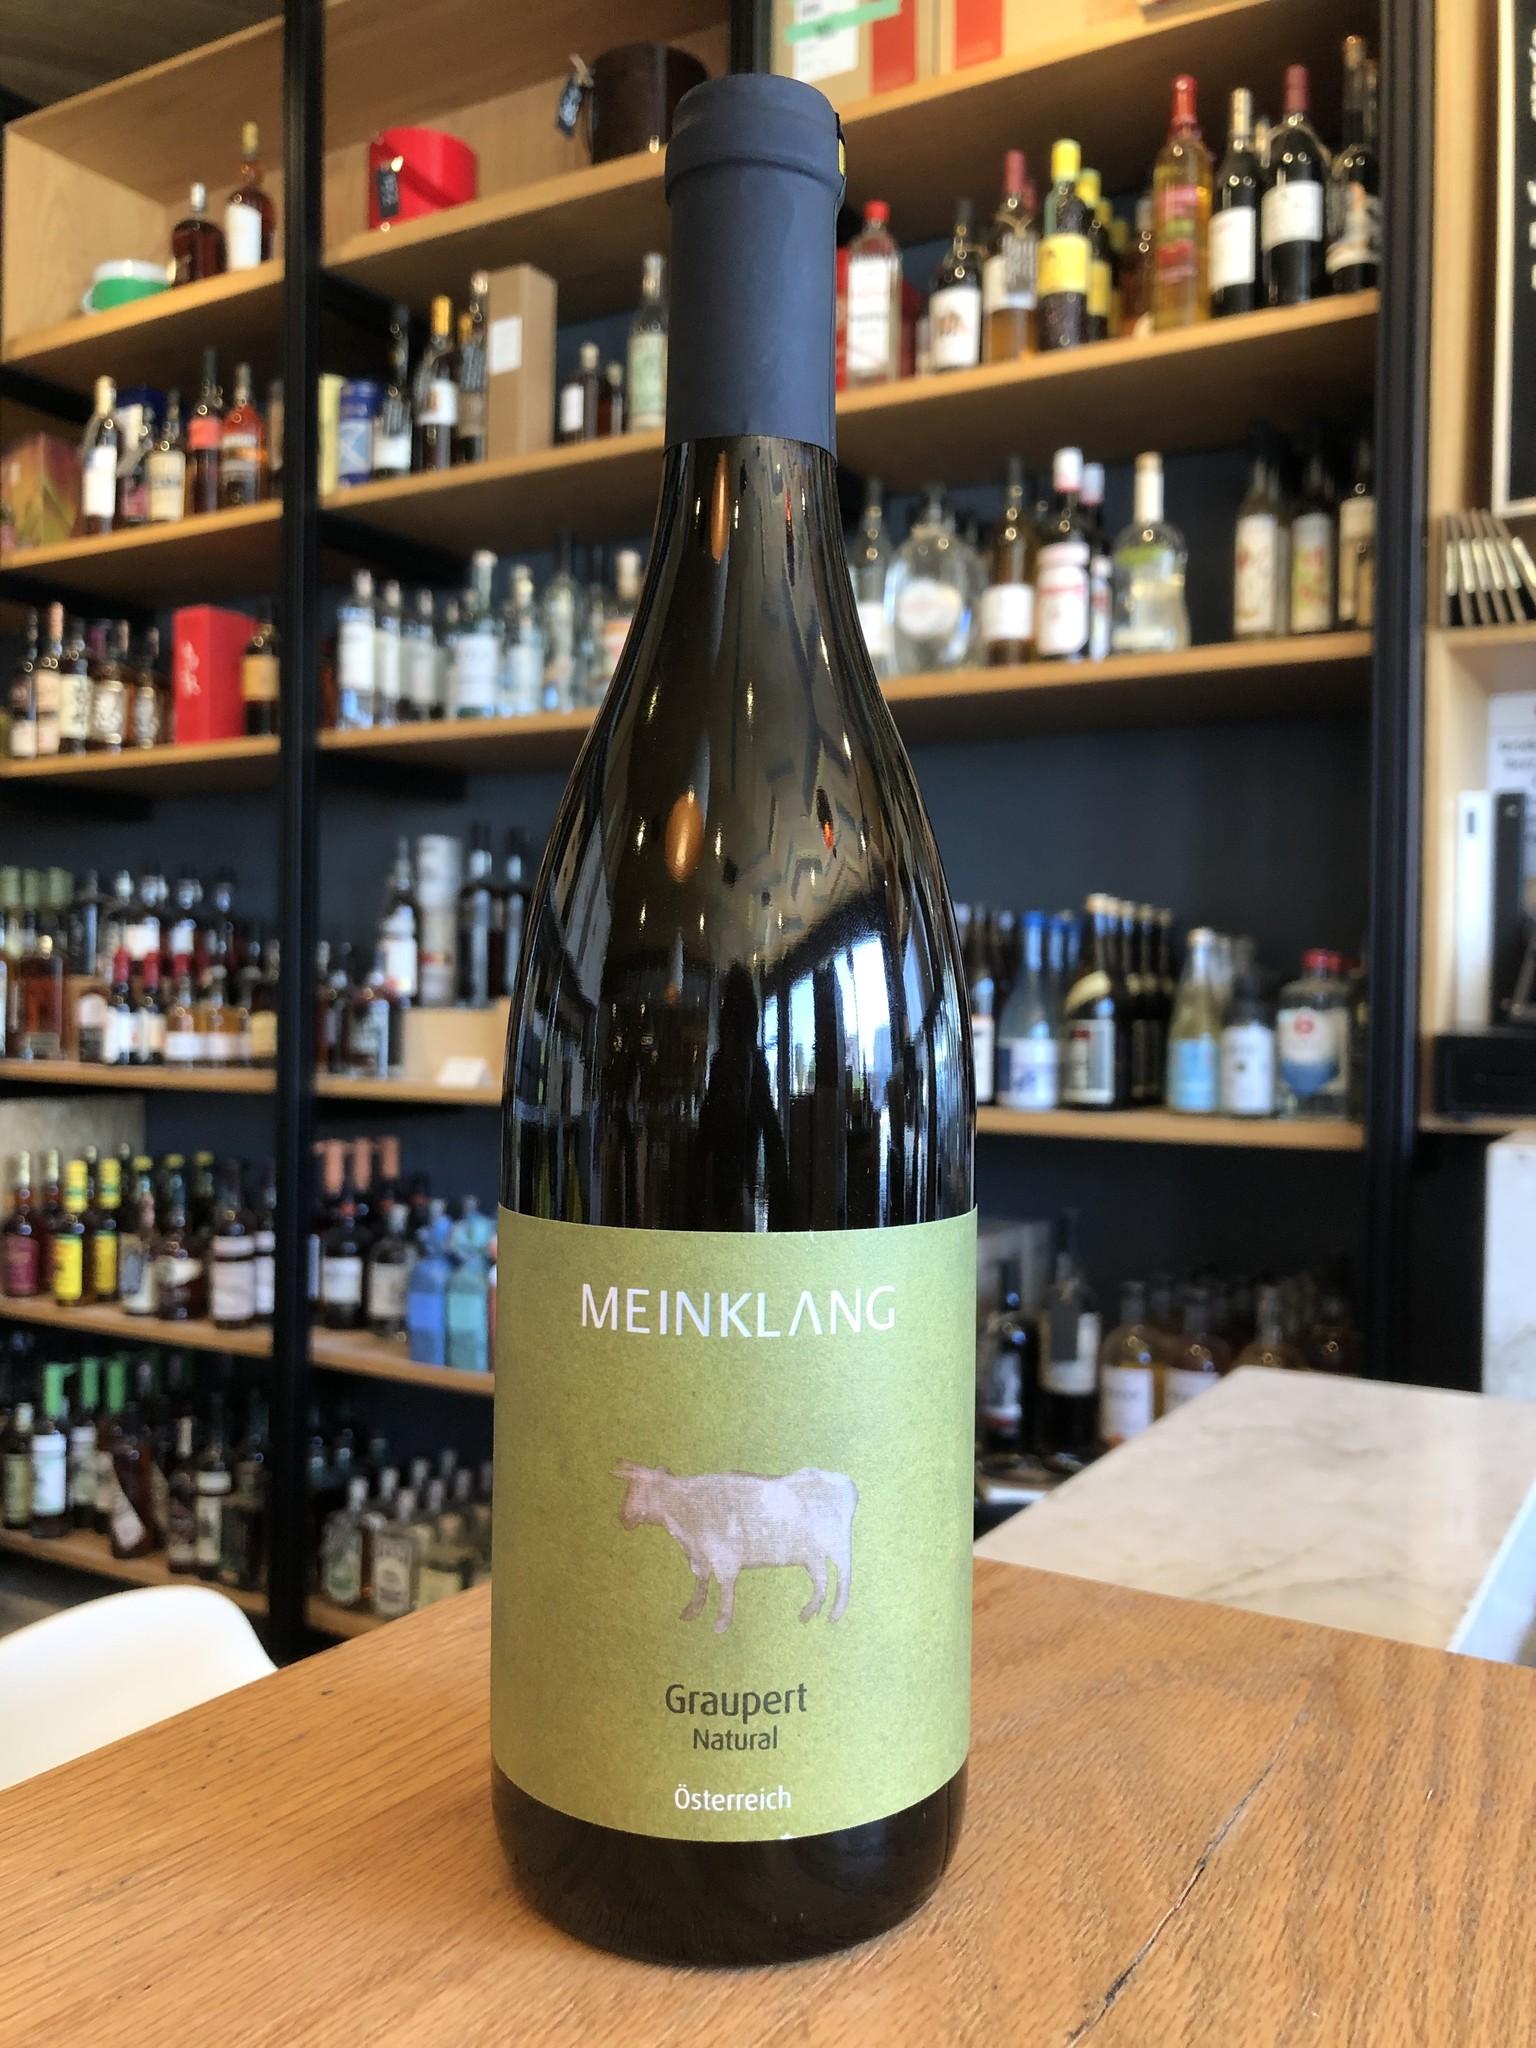 Meinklang 2017 Meinklang 'Graupert' Pinot Gris  750mL